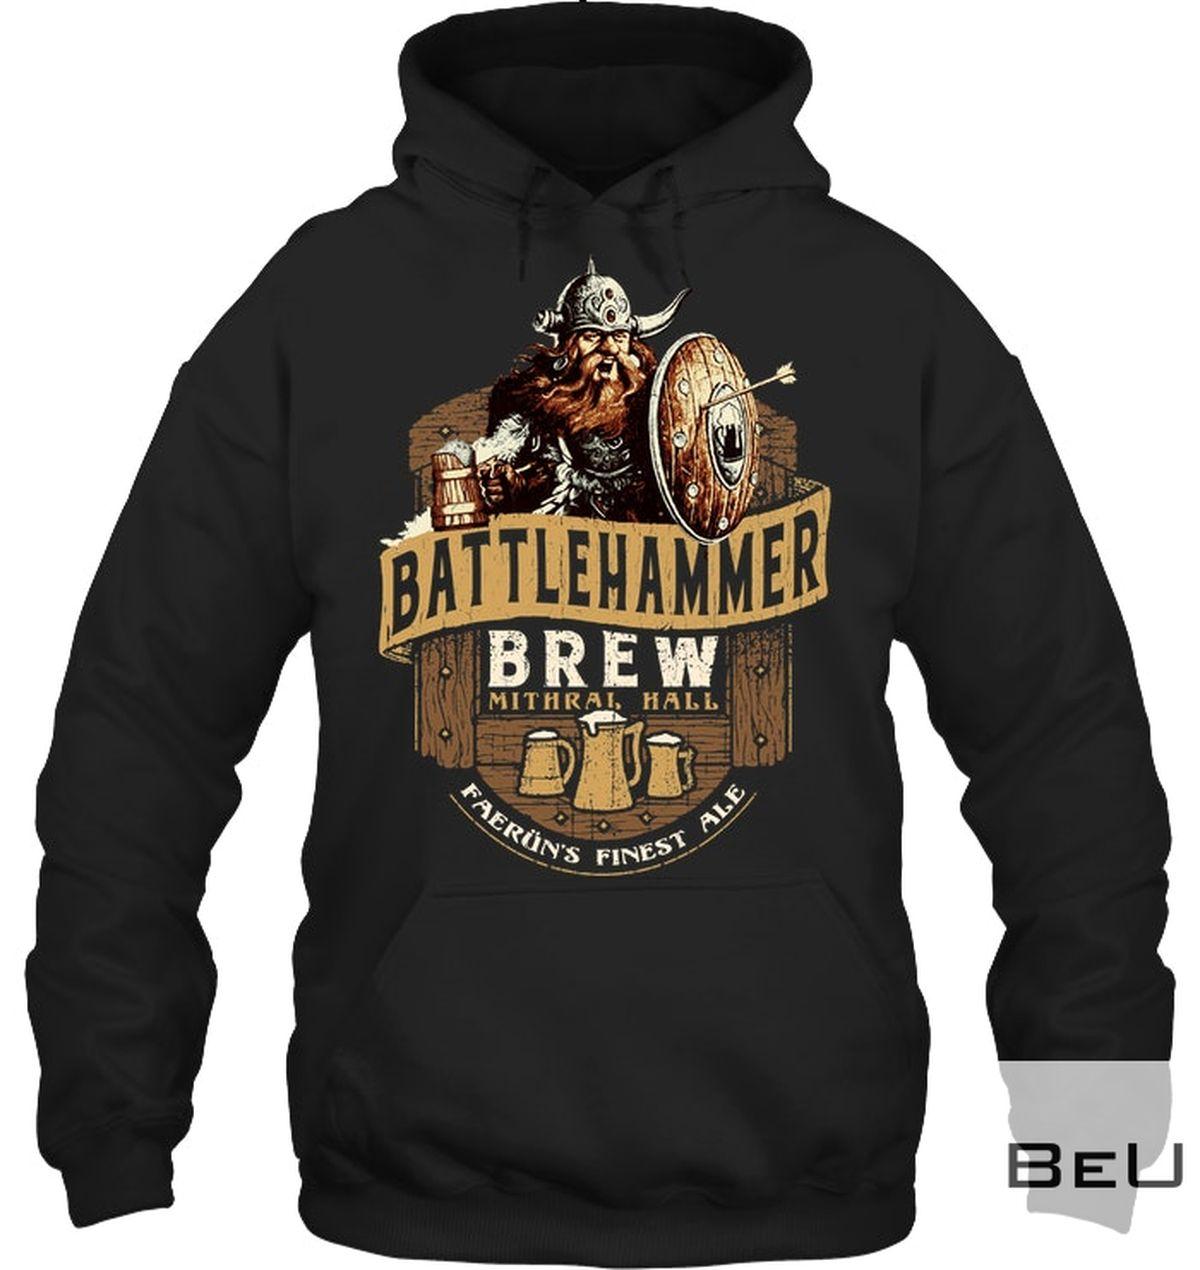 Battlehammer Brew Mithral Hall Faerun Finest Ale Shirtz